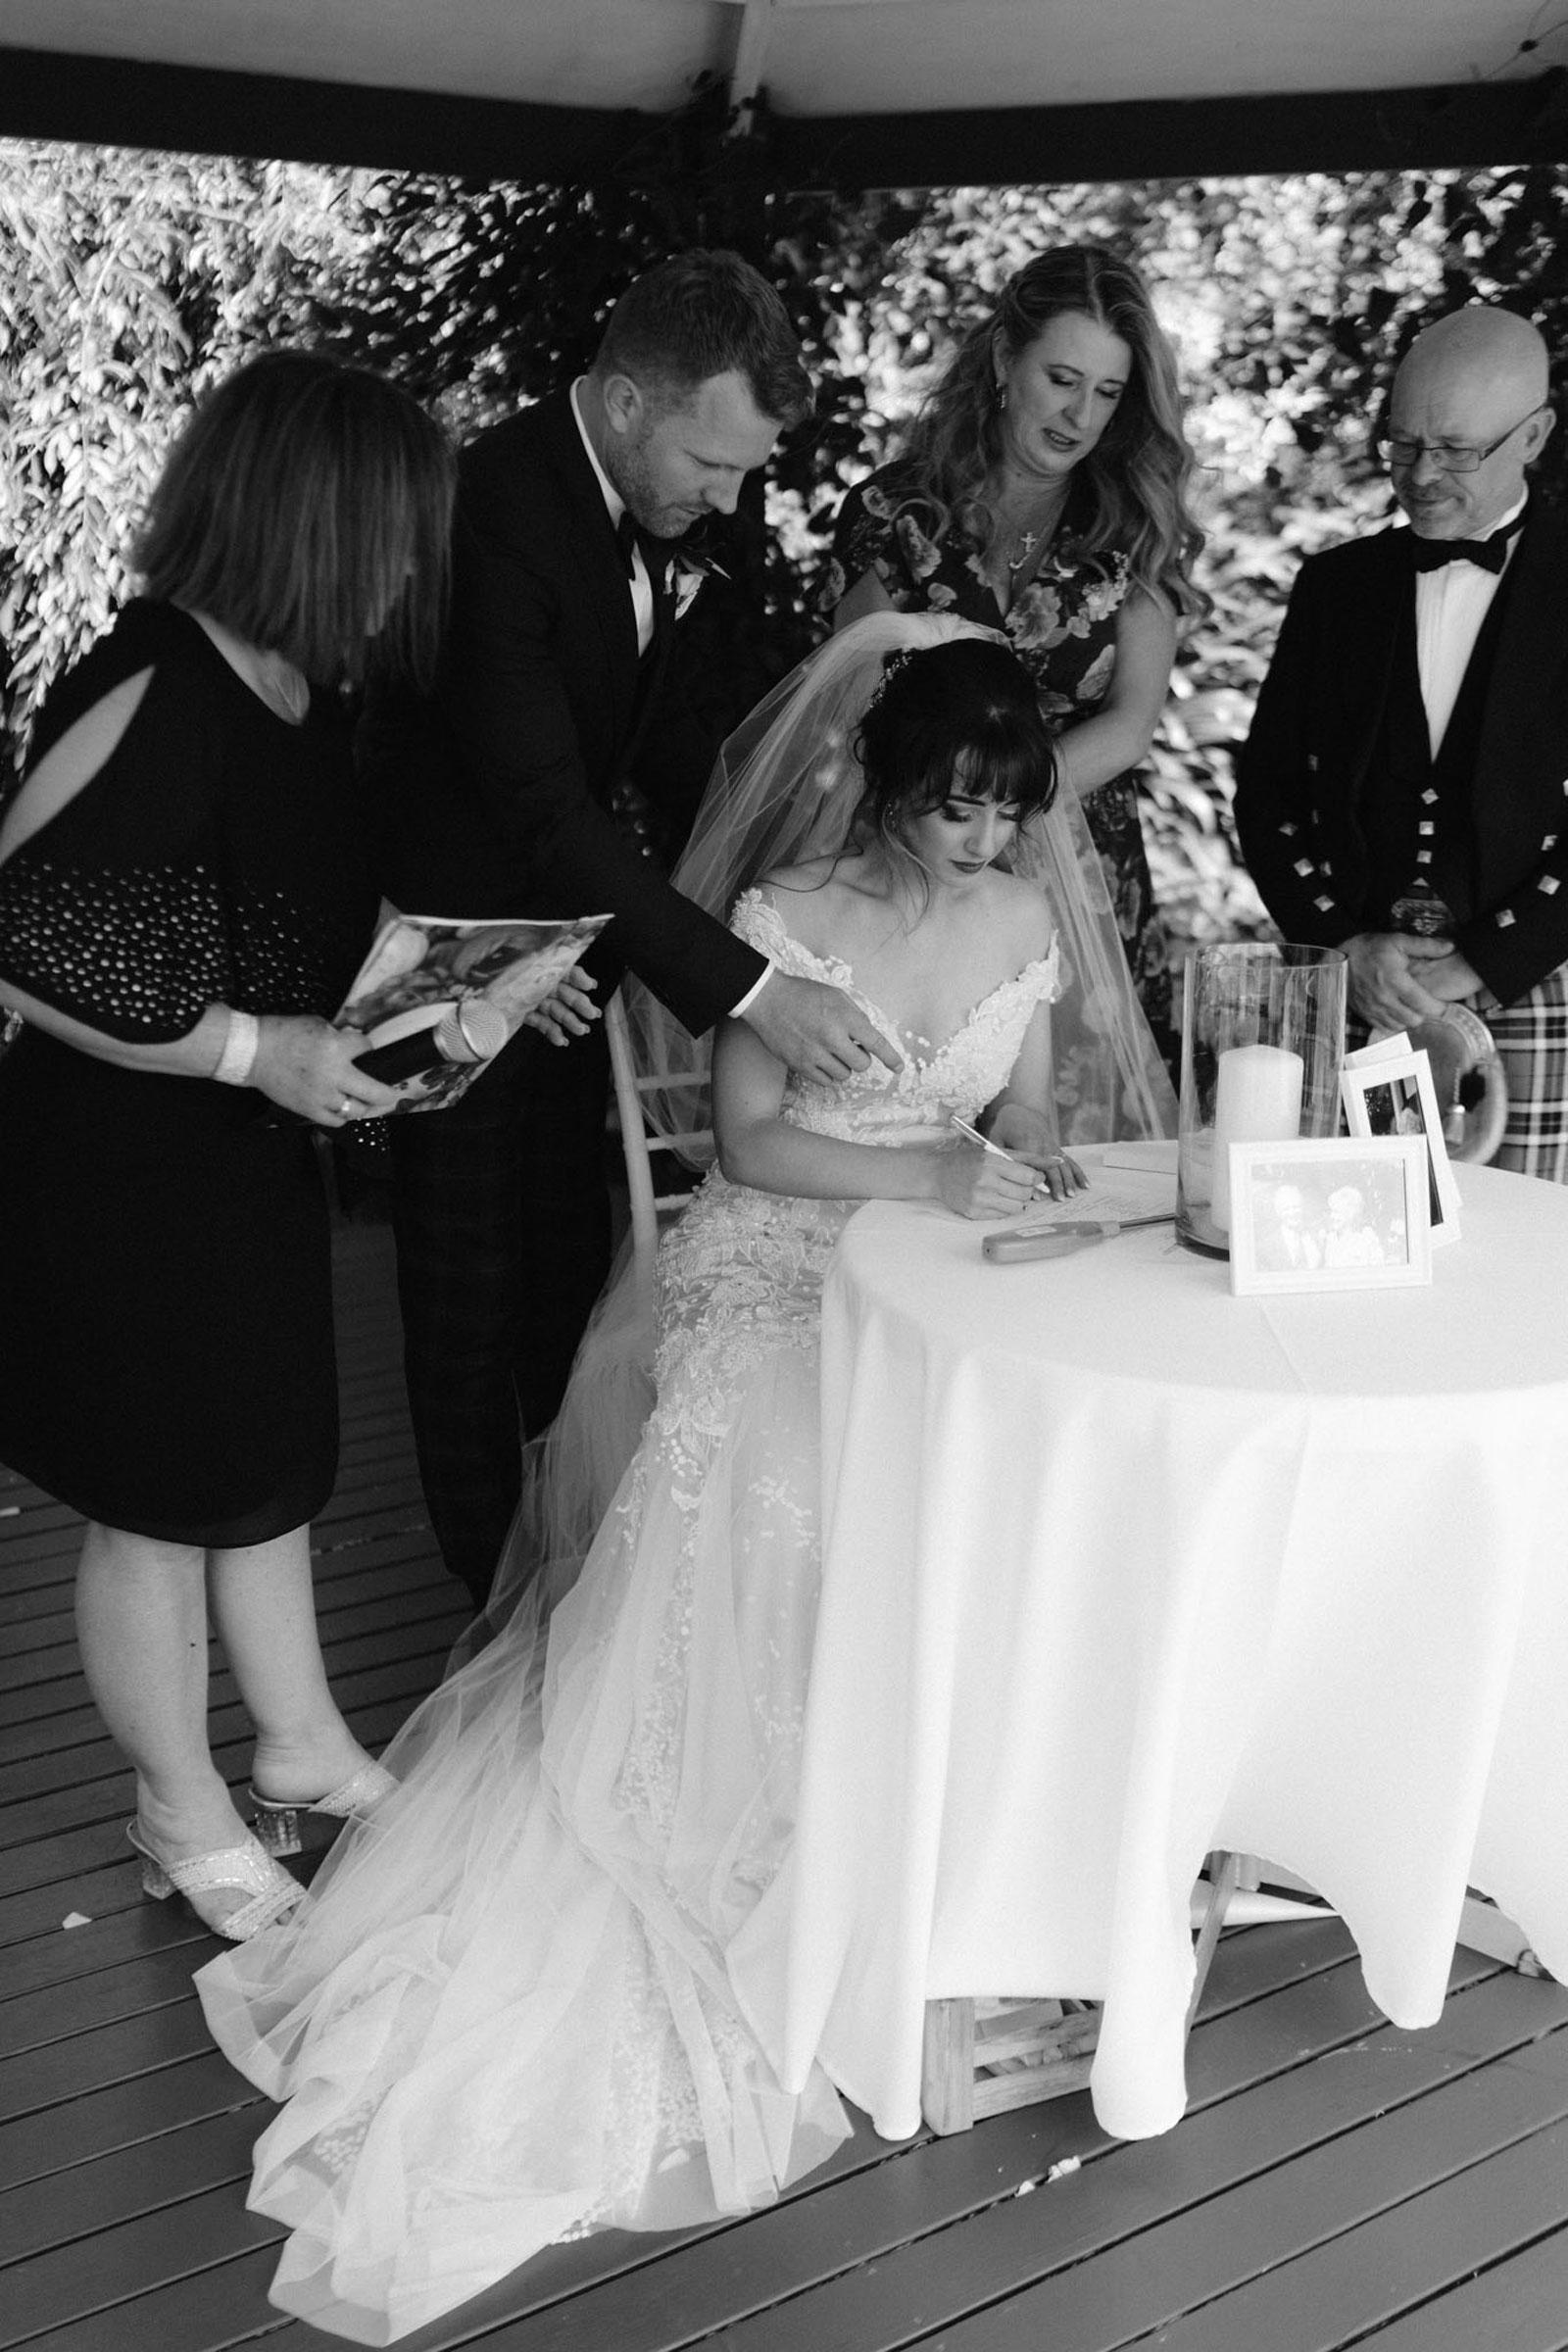 newfound-n-c-olive-tree-cottage-tauranga-wedding-photographer-474A